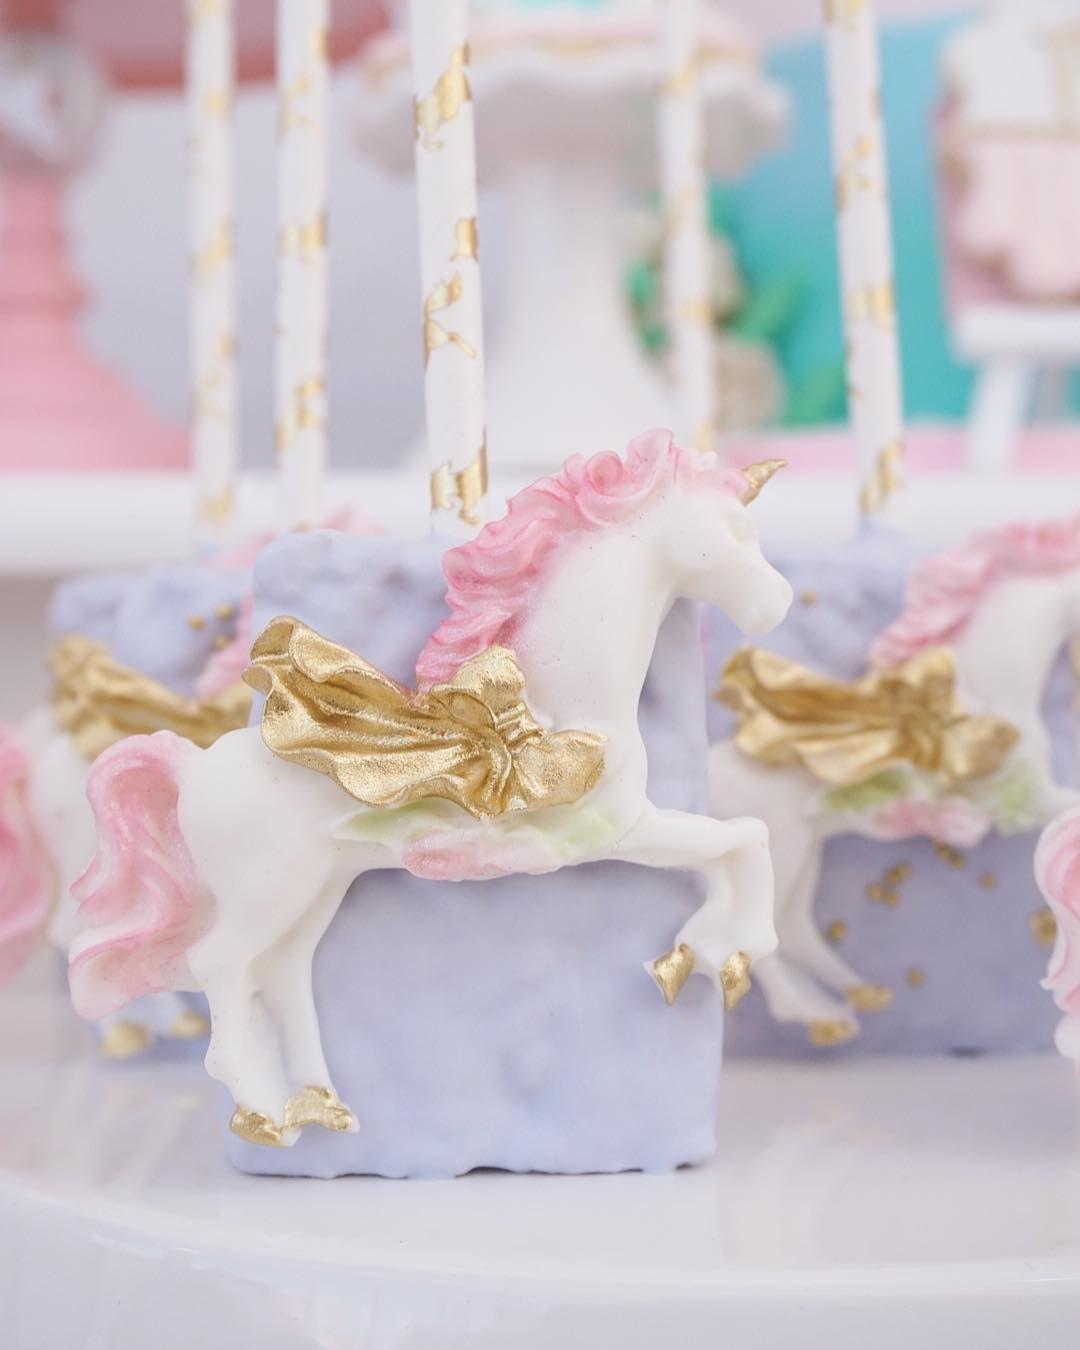 Unicorn Rice Krispies